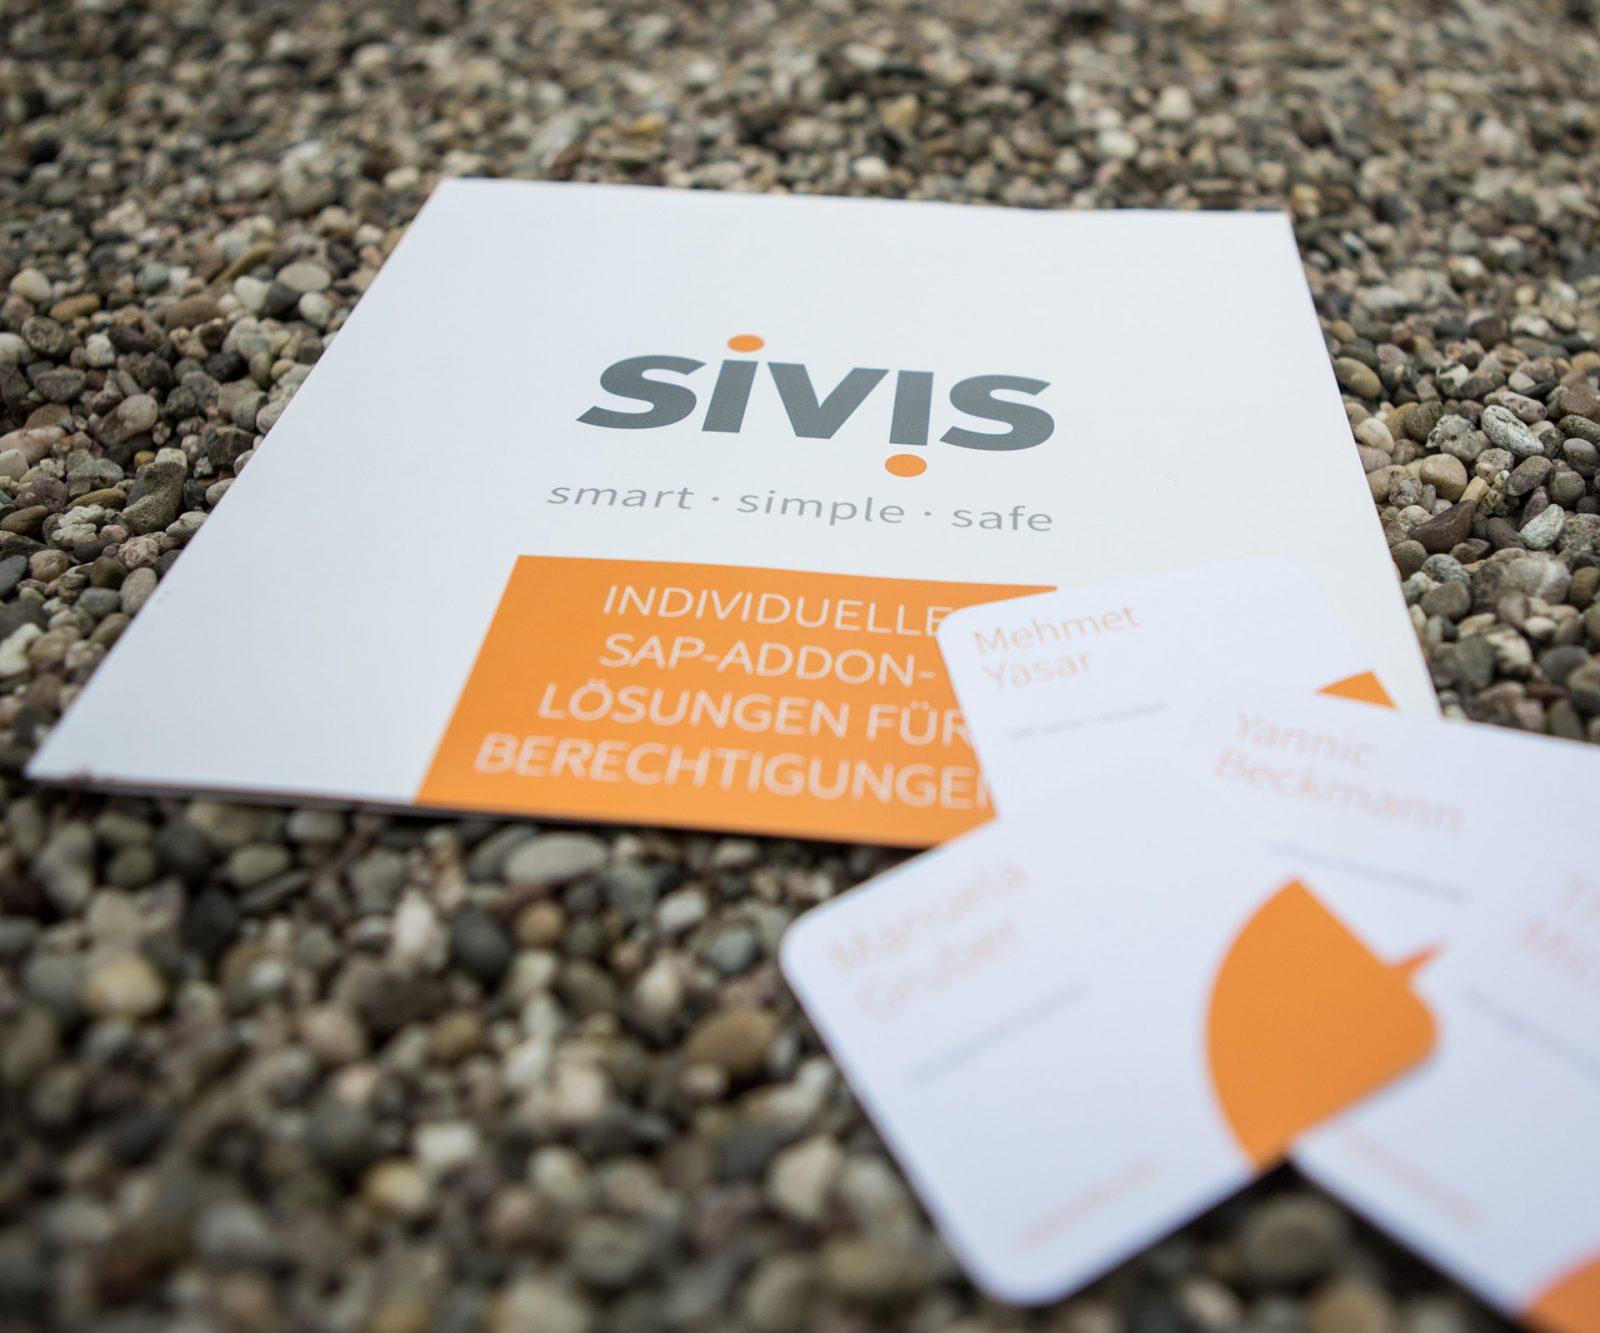 Sabath Media Werbeagentur - Sivis – Corporate Design - Referenzbild 1